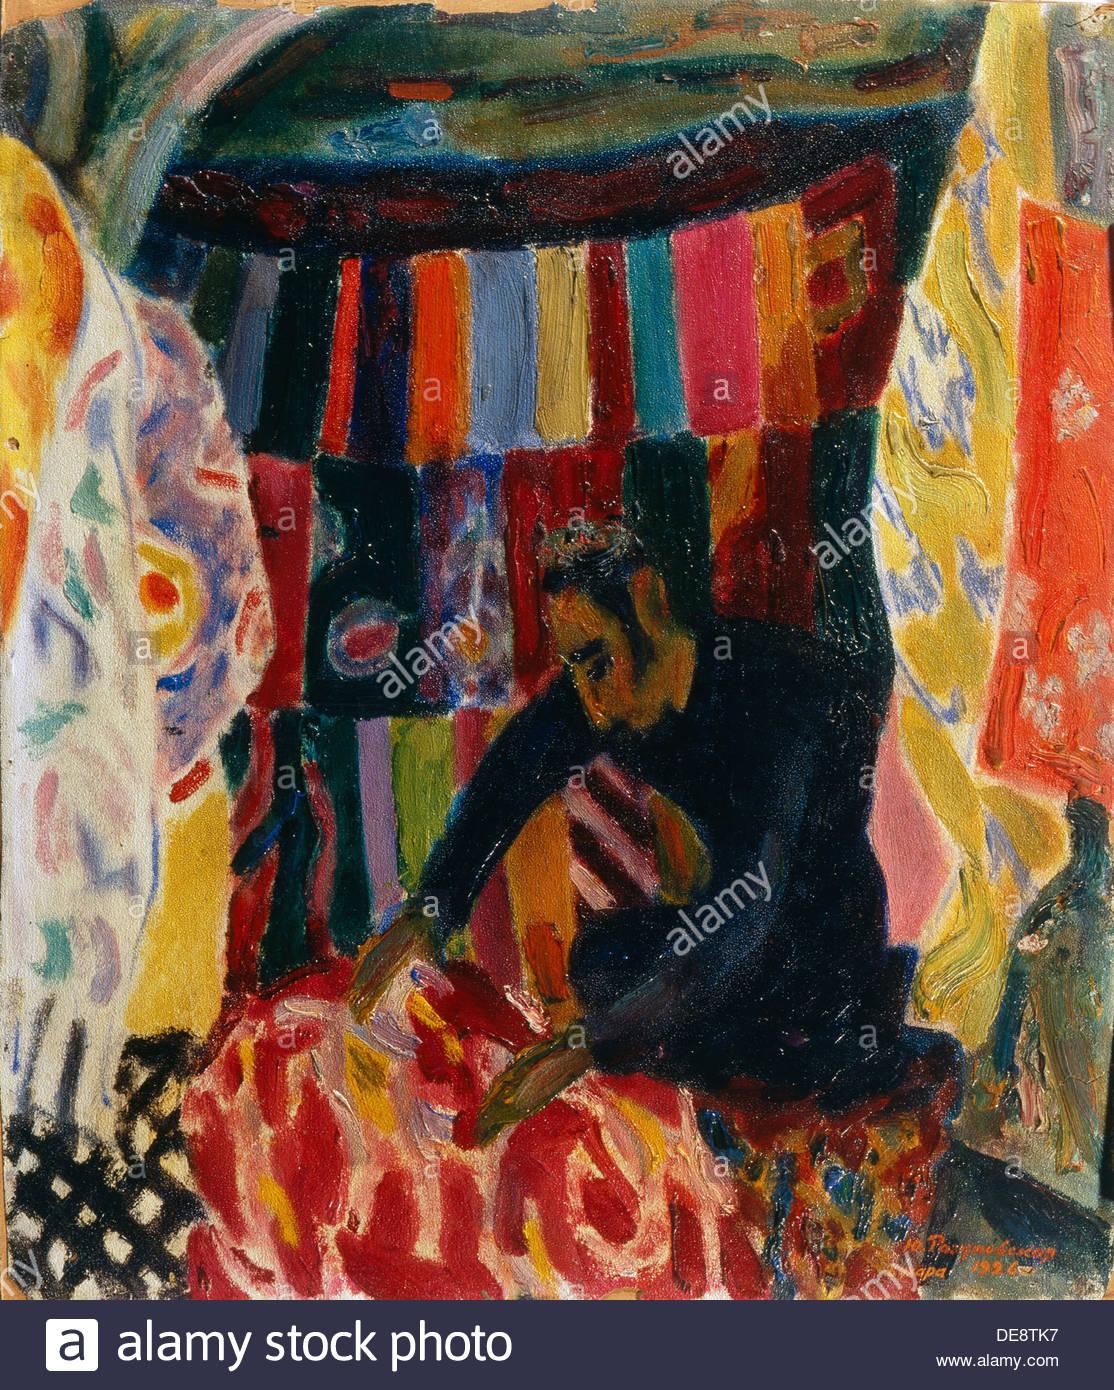 Bukhara. The Silk Seller, 1926. Artist: Razumovskaya, Julia (1896-1987) - Stock Image